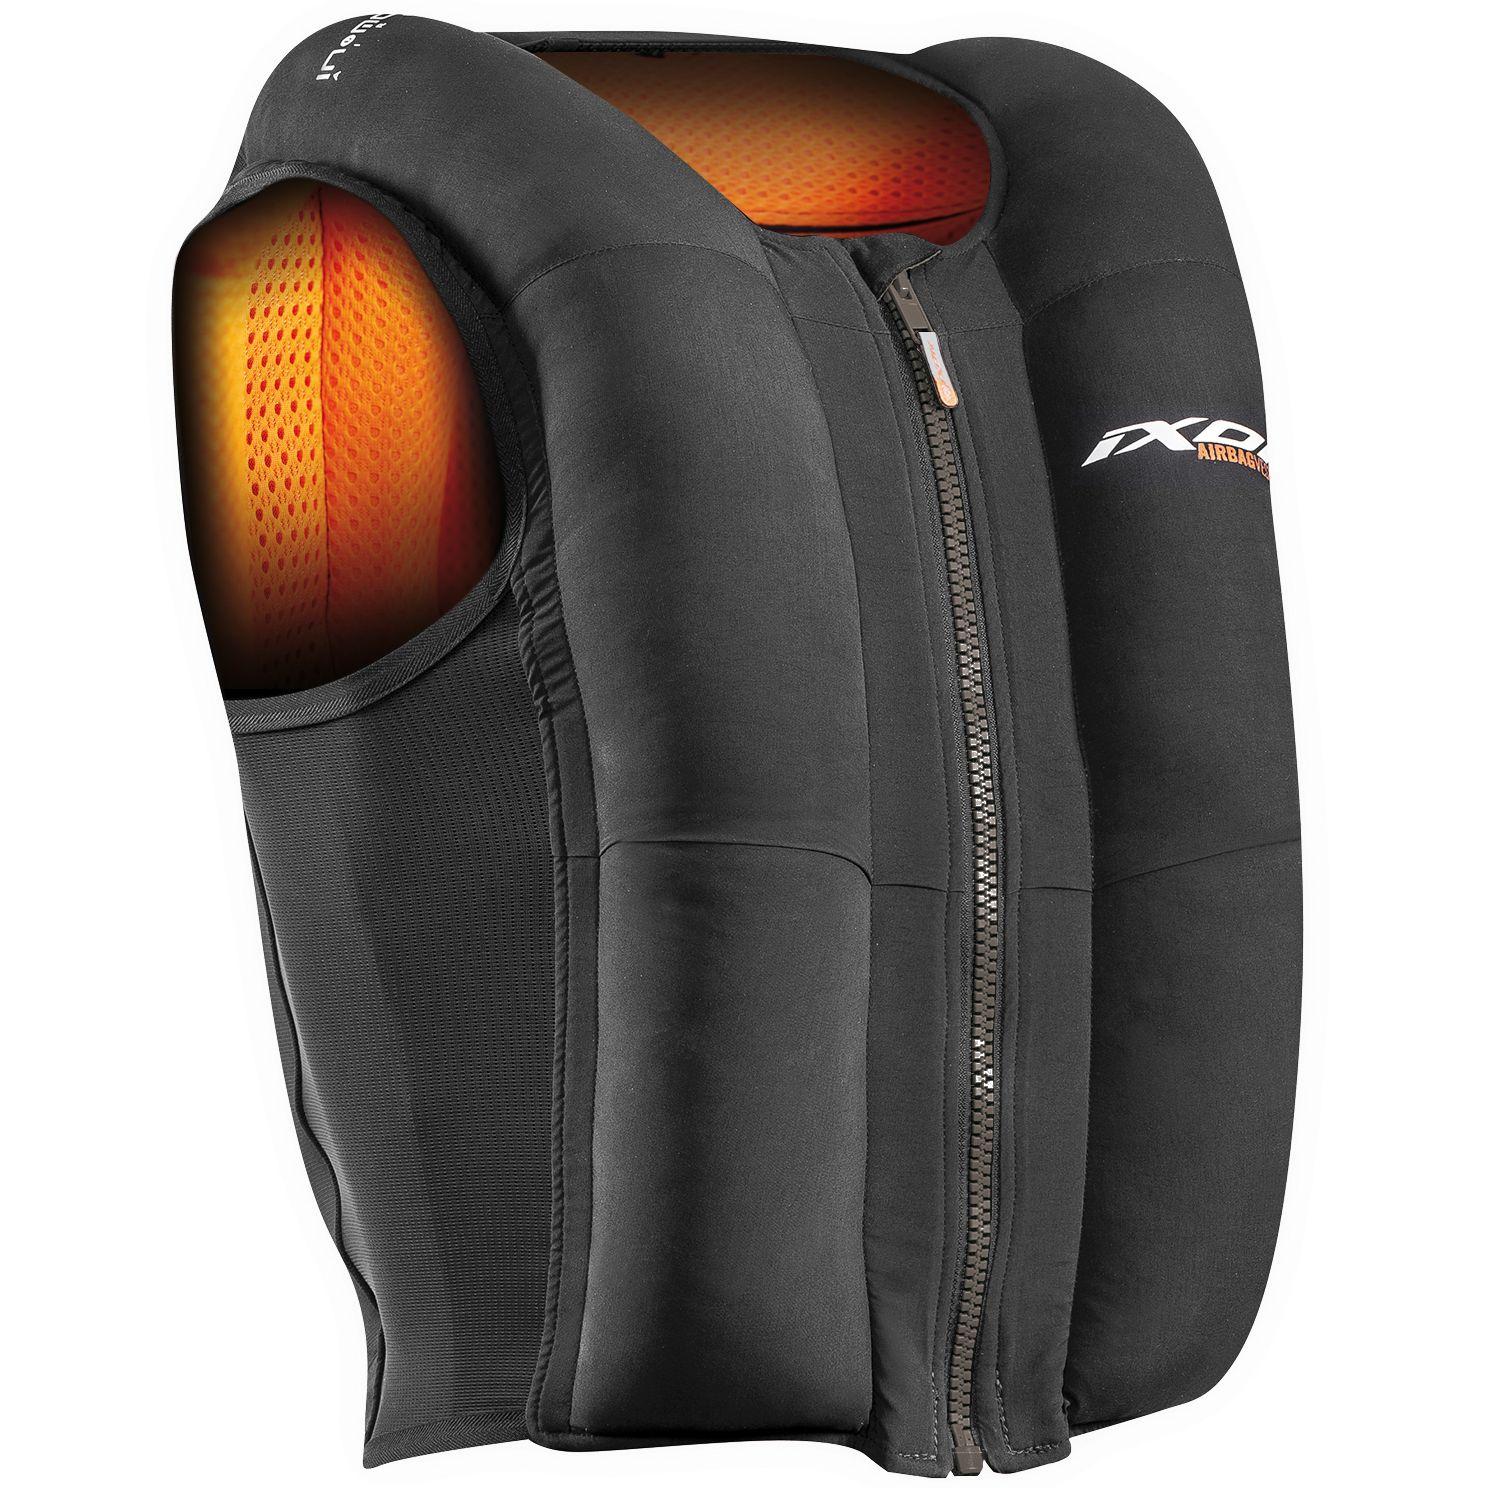 Gilet Airbag Ixon IX-Airbag U03 - Tailles au choix